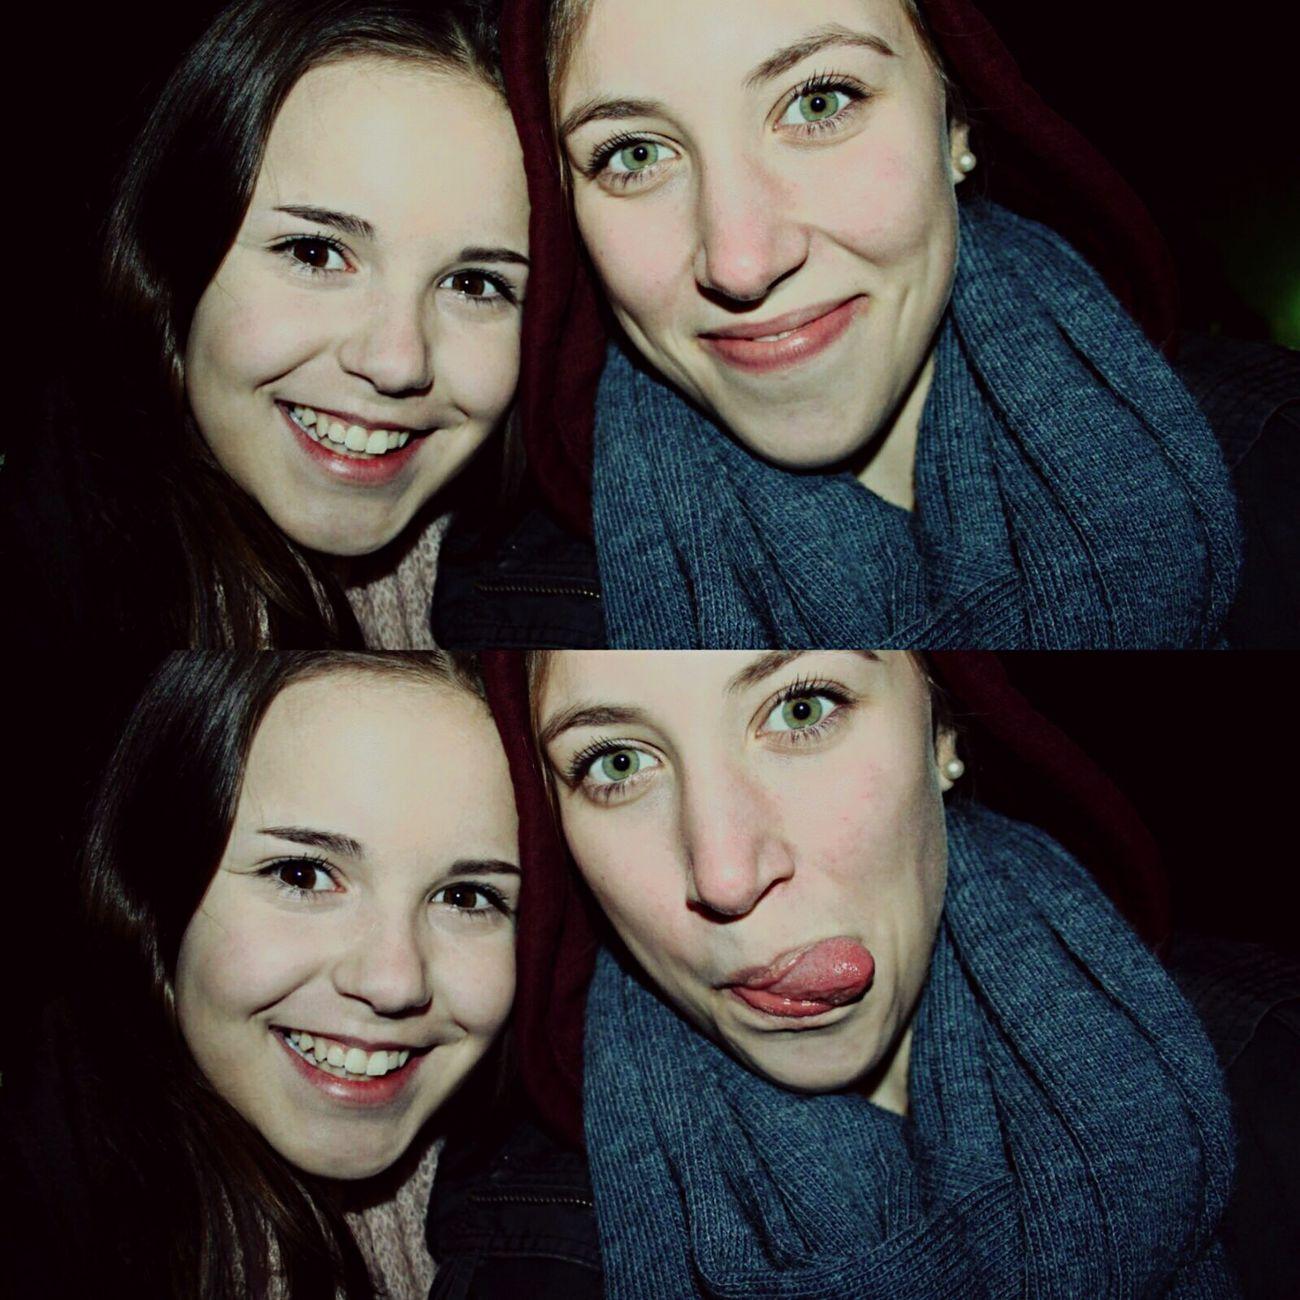 NYE With My Best Friend 💗🎆